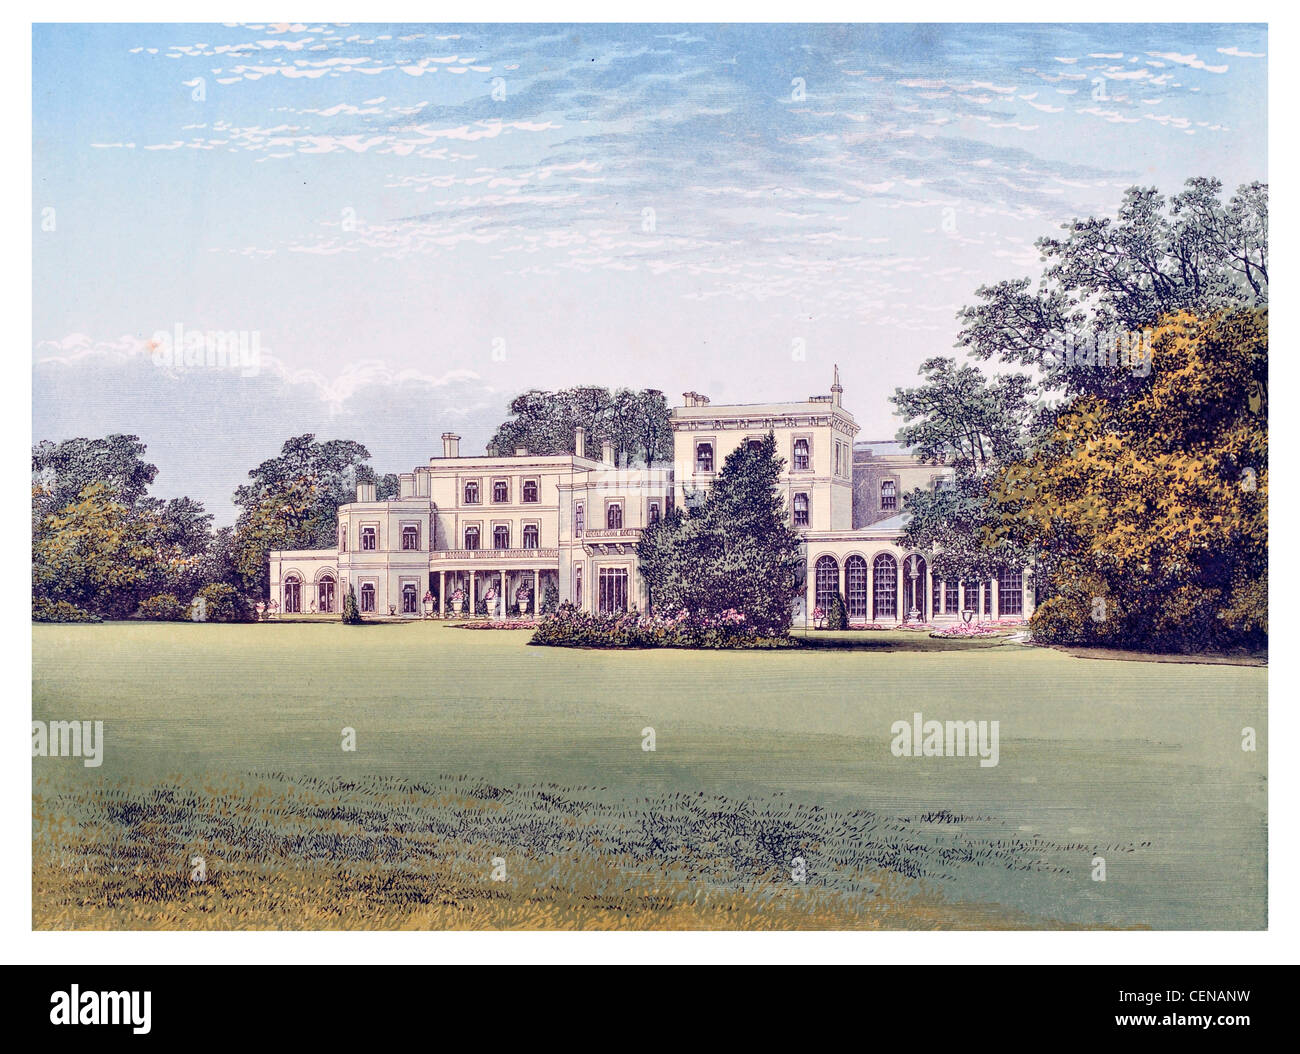 Danesfield House Medmenham Buckinghamshire England UK Parkland Park Mansion Manor House Stately Home Hall Palace Stock Photo